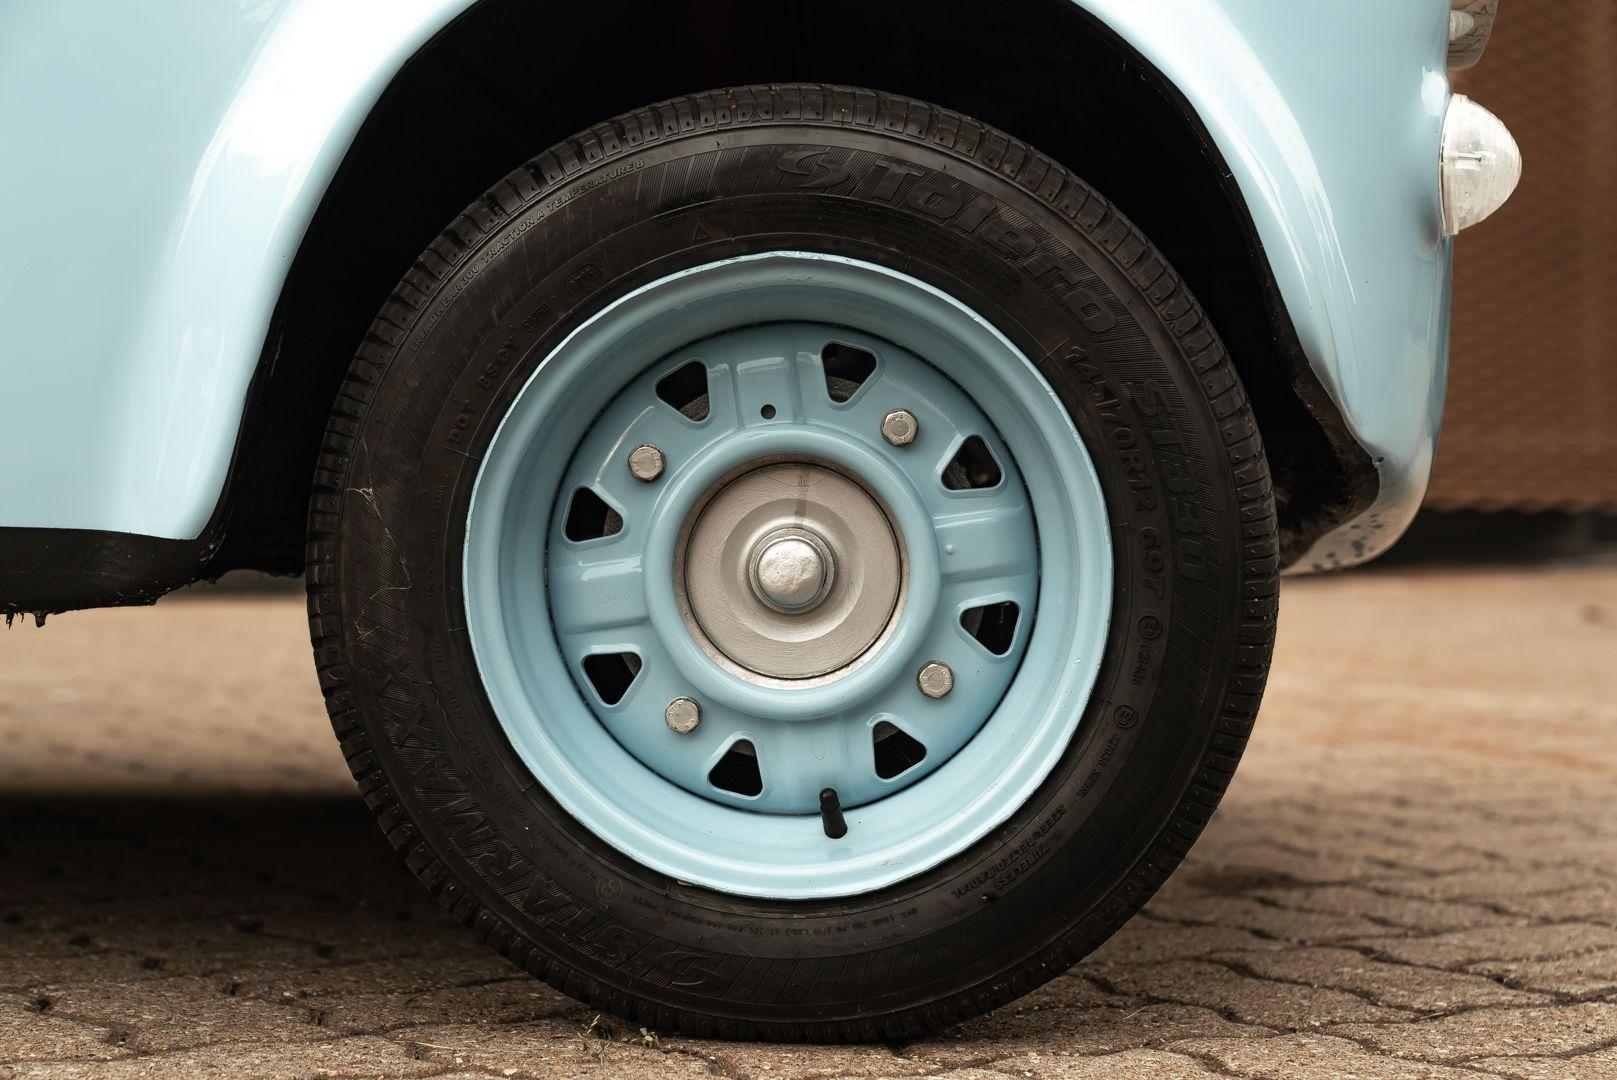 1971 Fiat 500 F Replica Speedster 80061